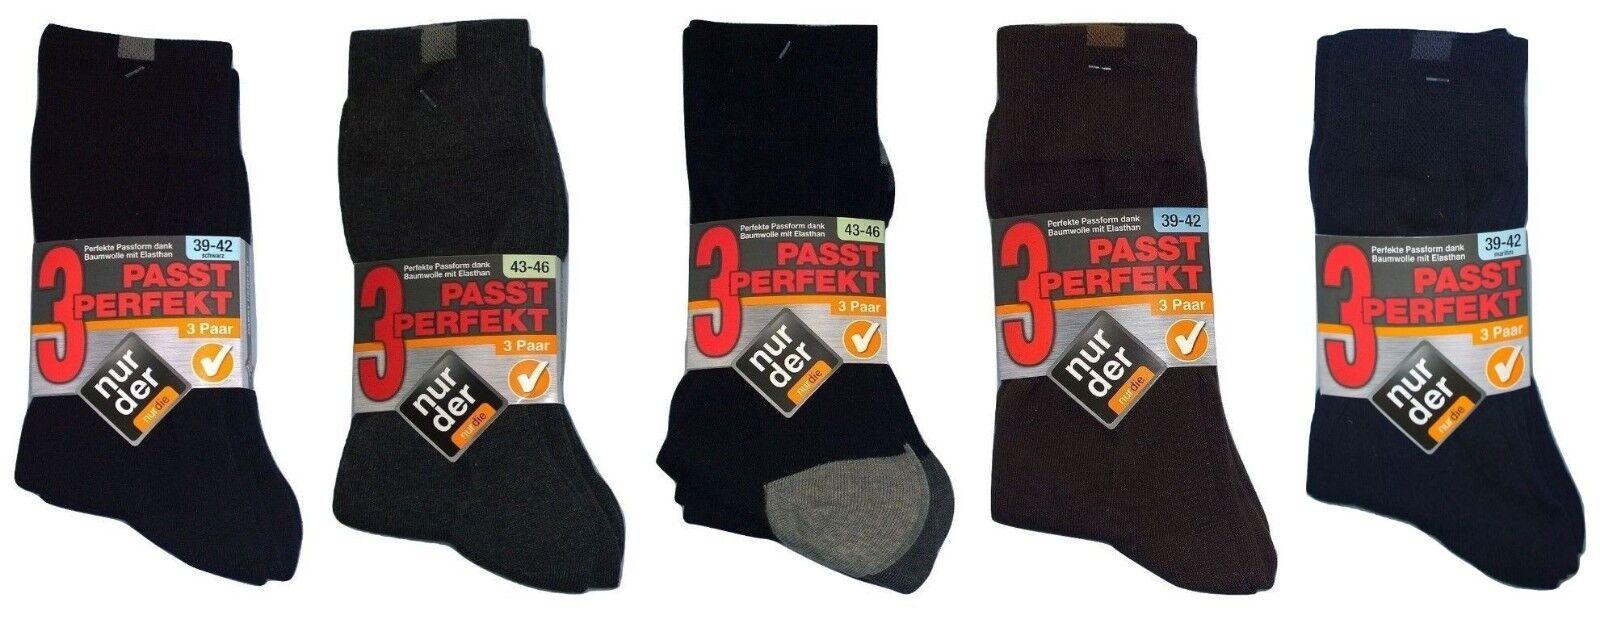 Nur Der Passt Perfekt Herren Socken 3er Pack